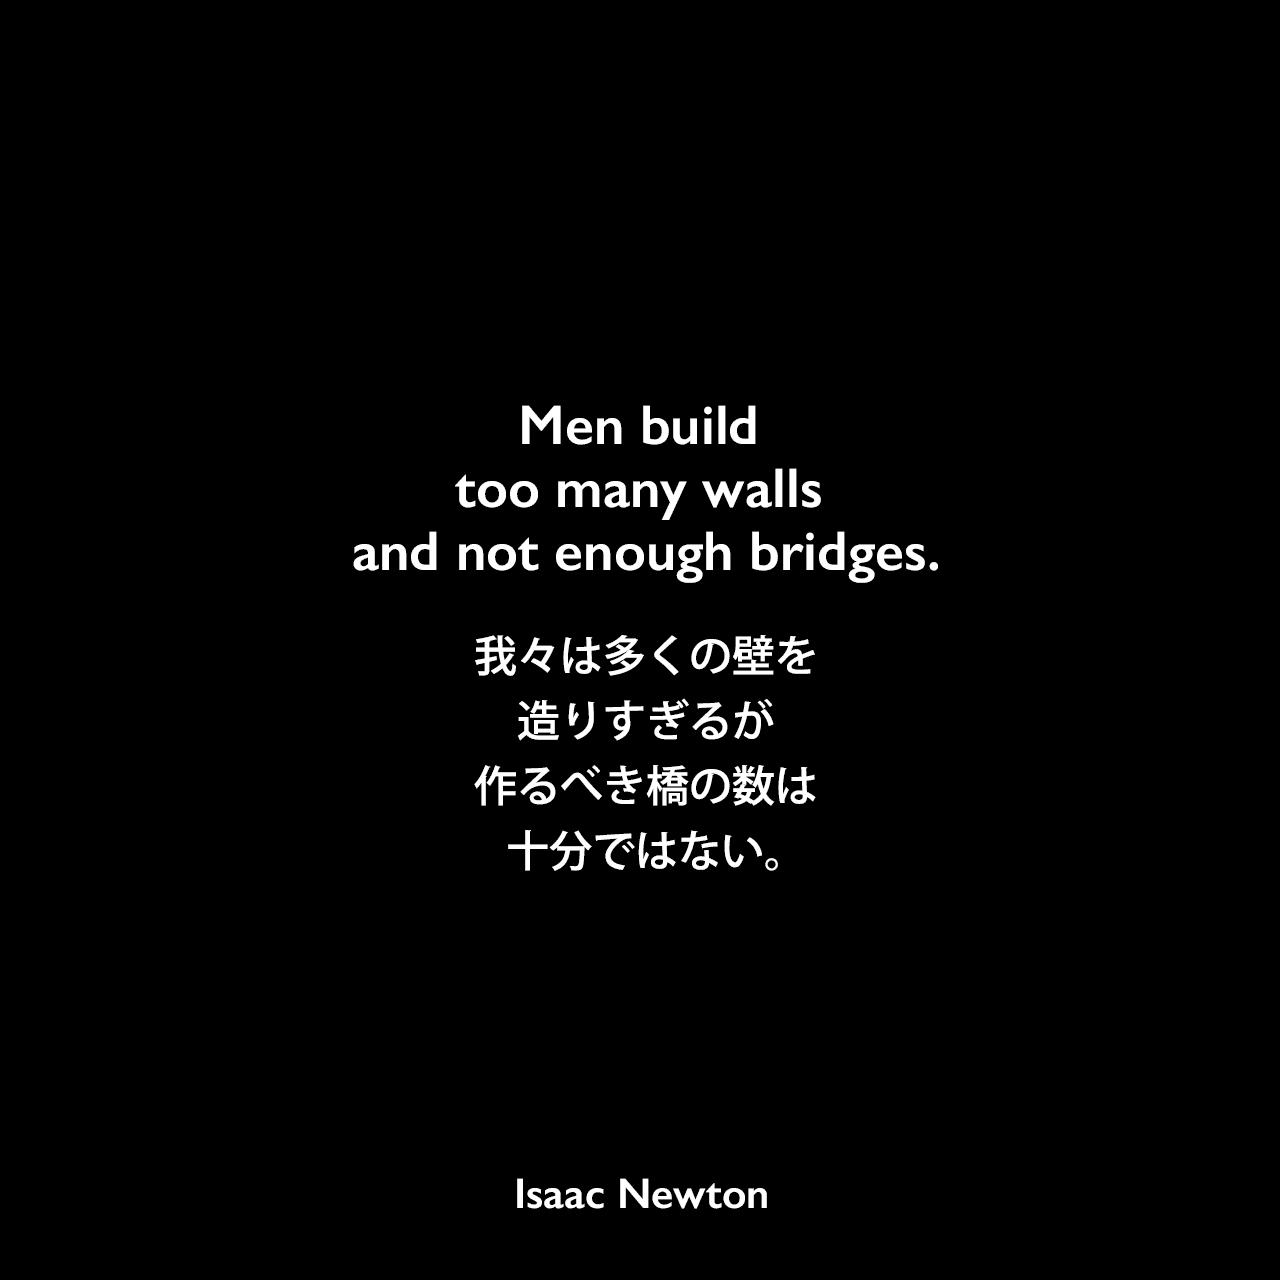 Men build too many walls and not enough bridges.我々は多くの壁を造りすぎるが、作るべき橋の数は十分ではない。Isaac Newton